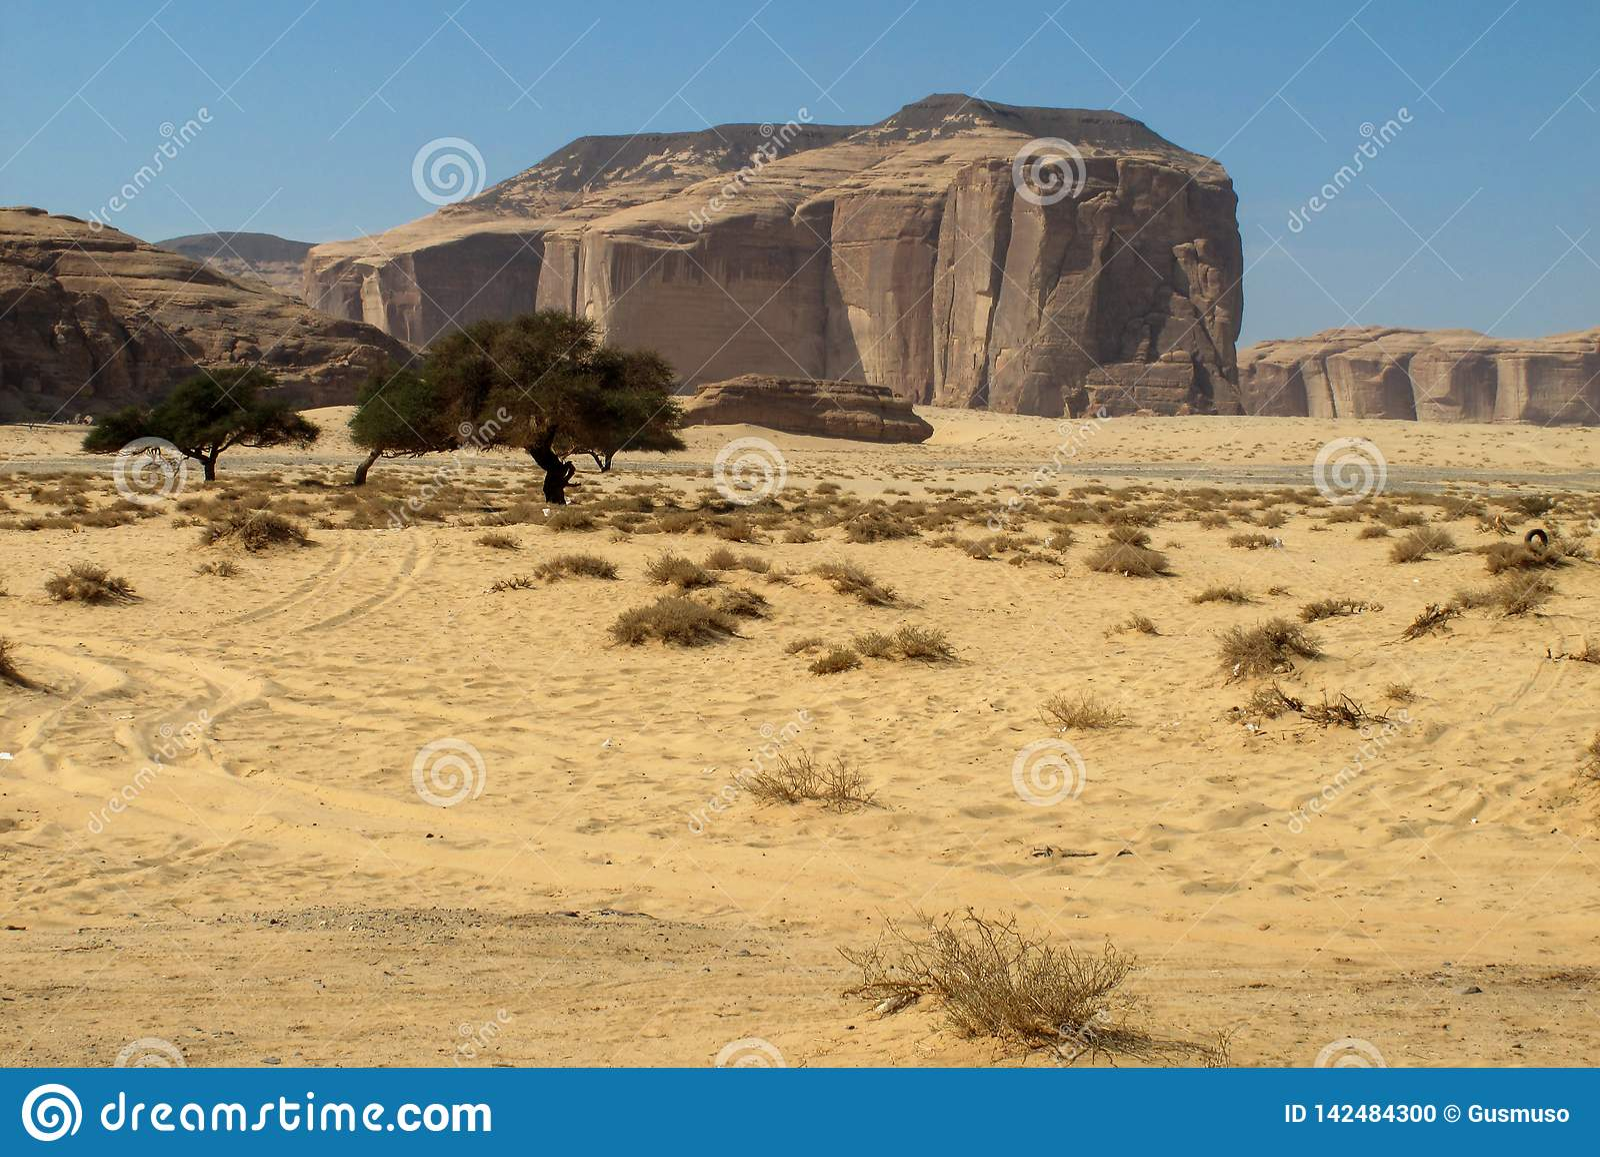 Madain Saleh, archäologische Fundstätte mit Nabatean-Gräbern in Saudi-Arabien KSA